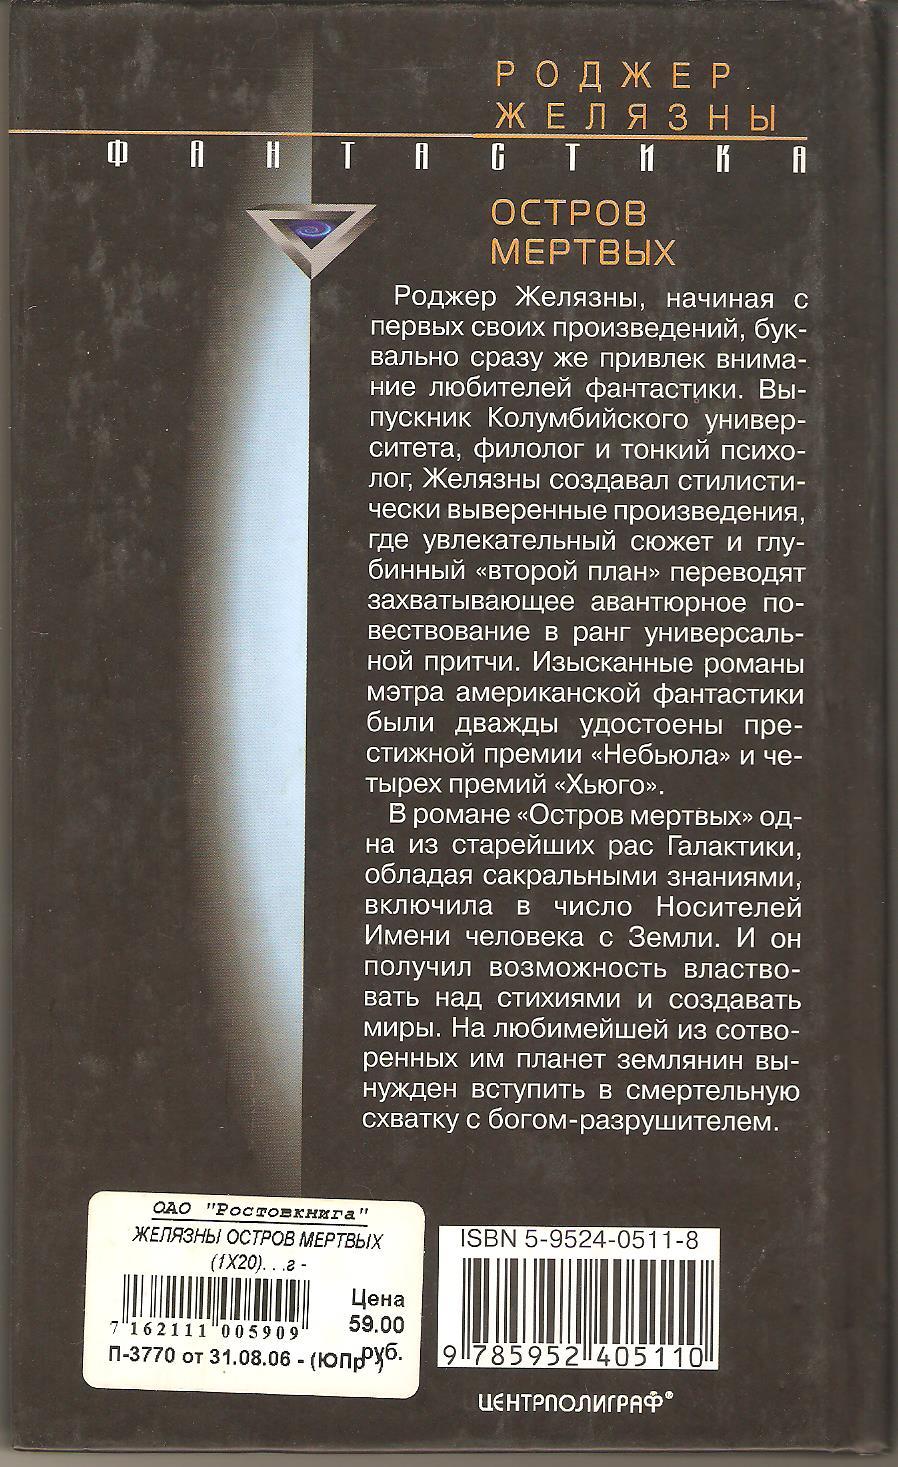 Р. Желязны. Остров мертвых 002.jpg